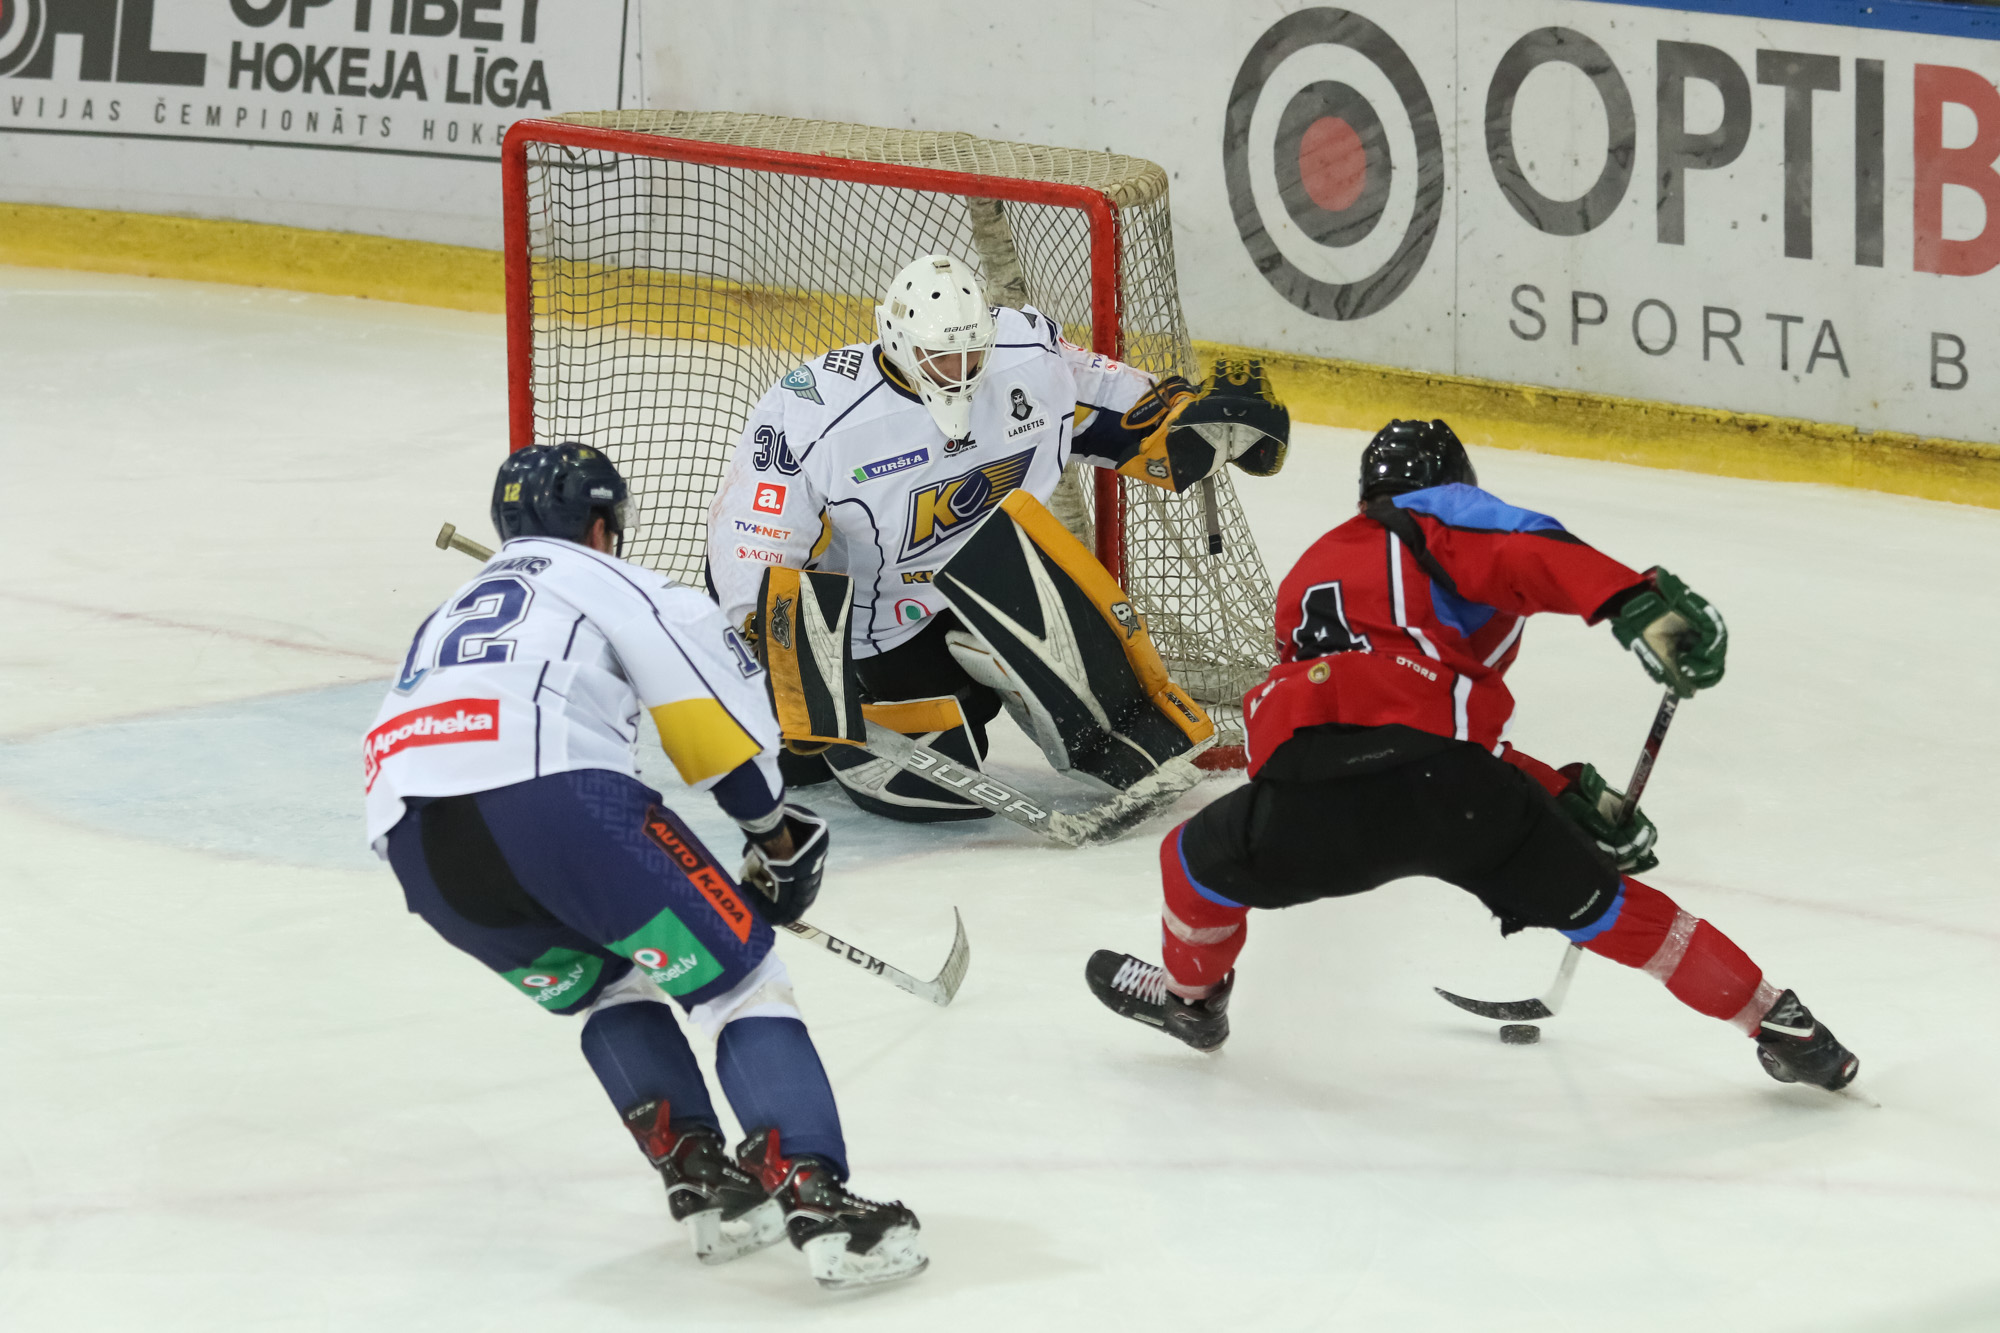 Amber cup otrajā spēlē uzvaram Zemgale/LLU